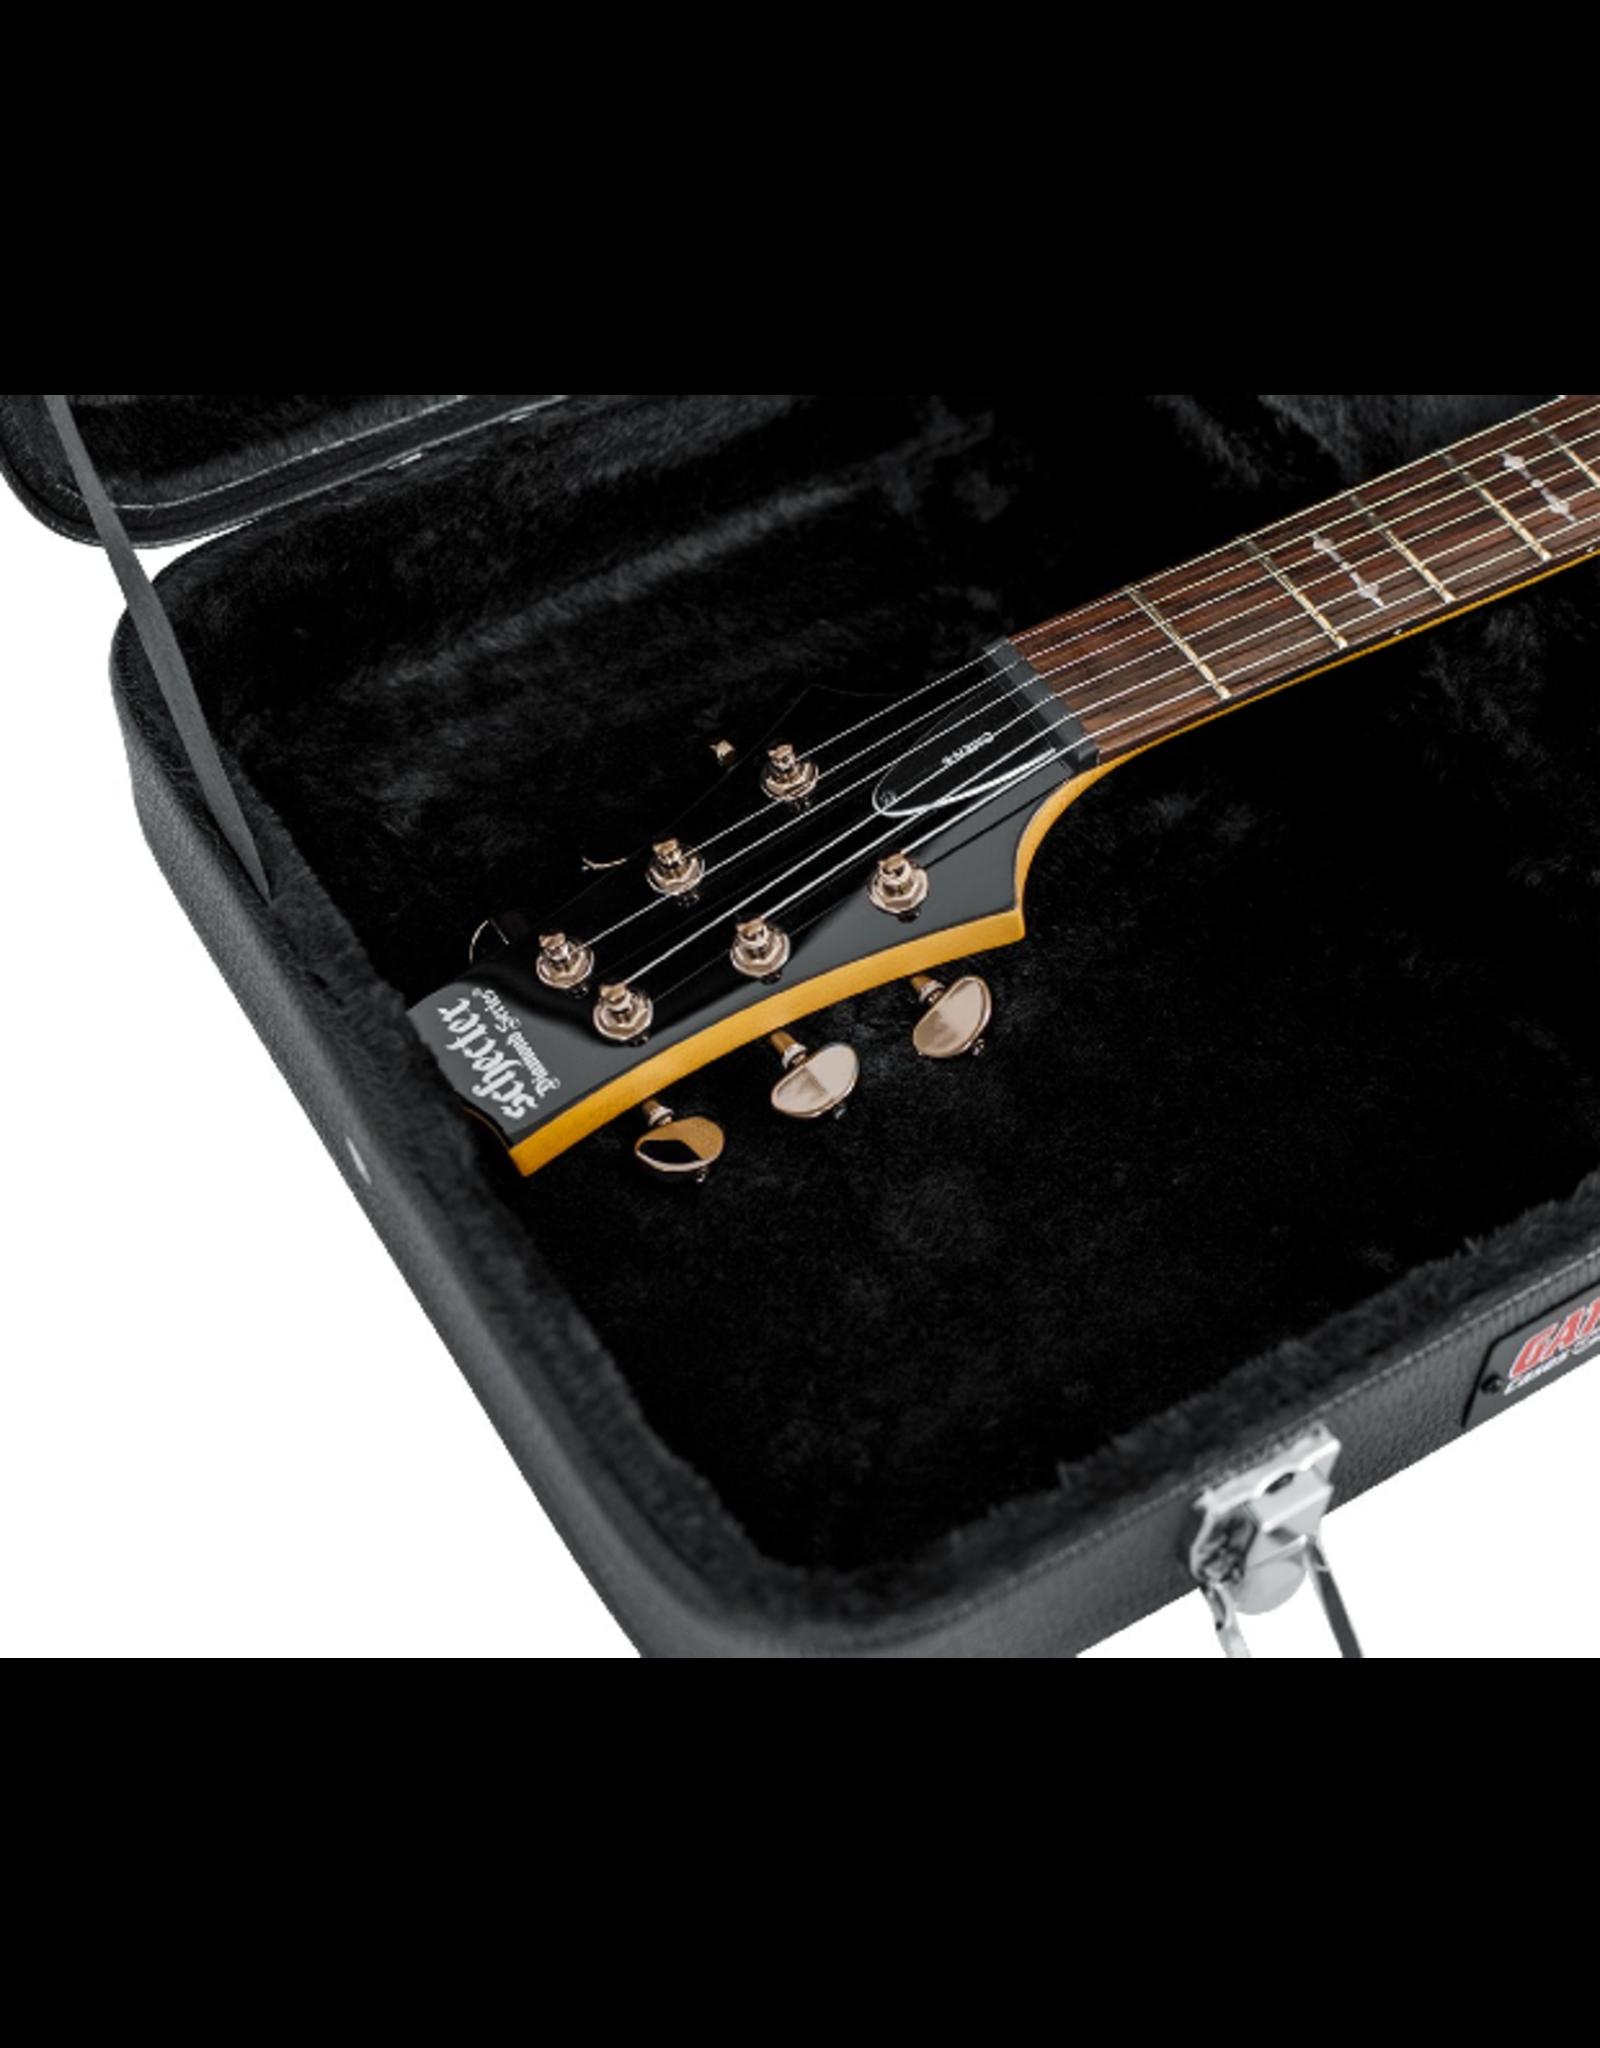 Gator Gator GWE Electric Hardshell Electric Guitar Case